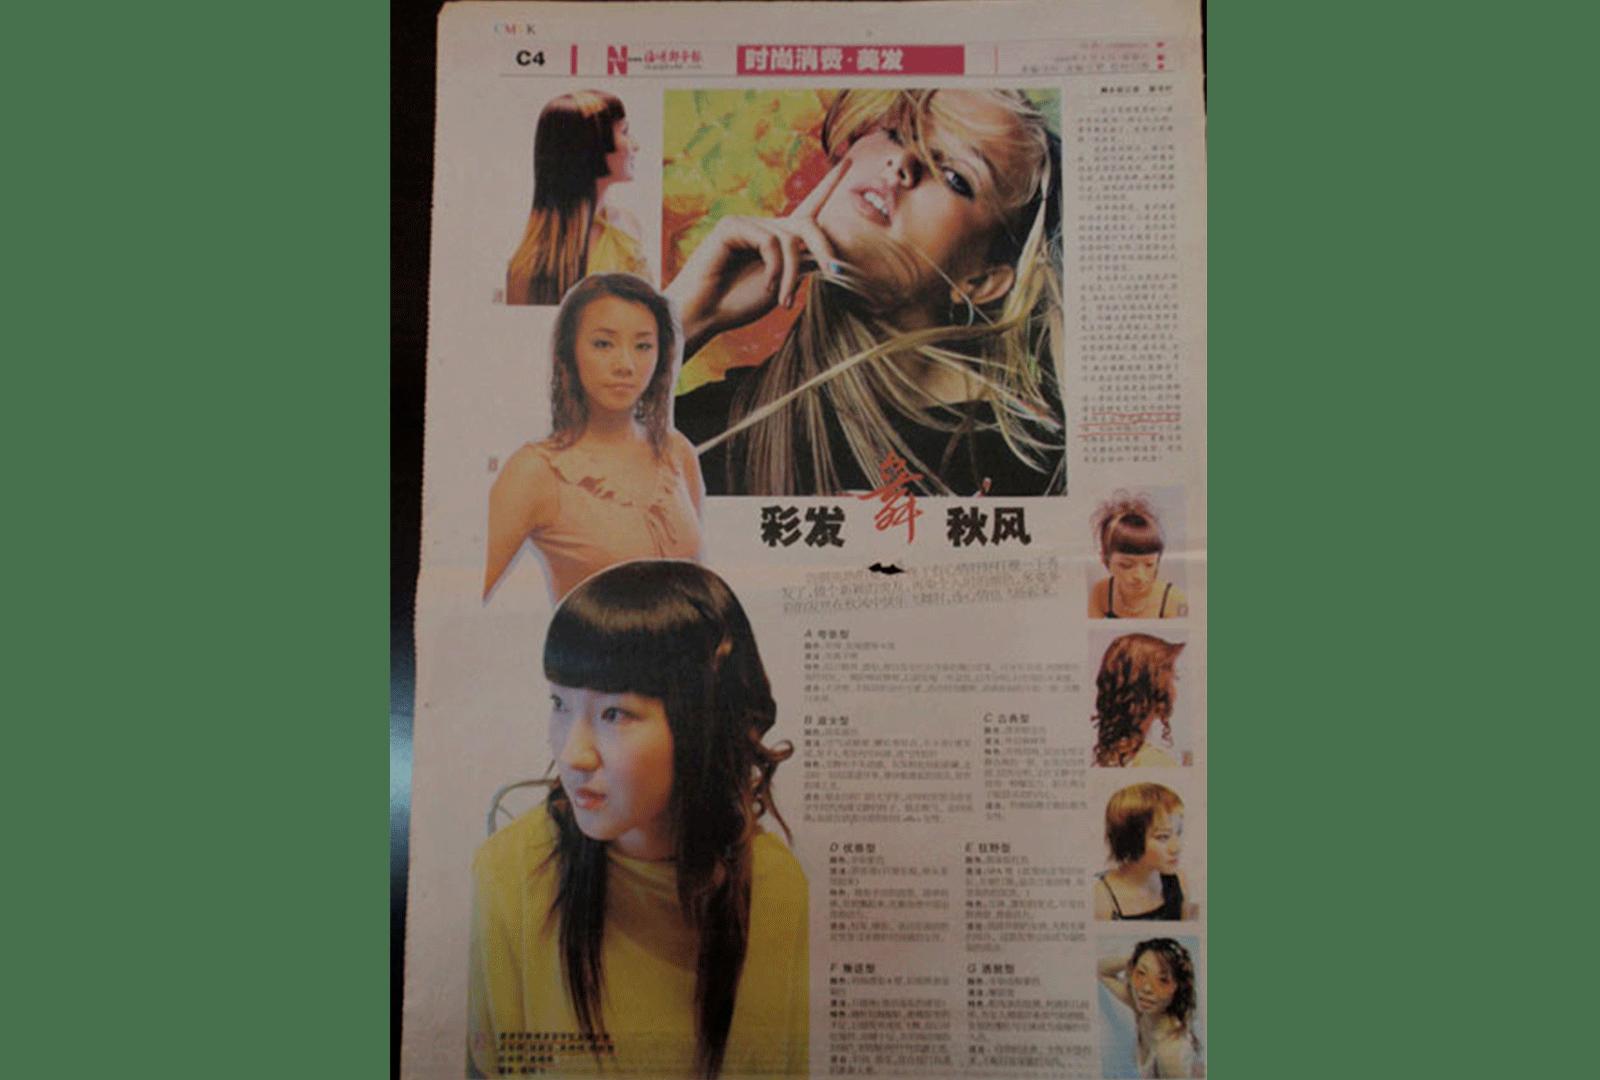 _0000s_0018_海峡都市报-2004-9-4-时尚生活·美发